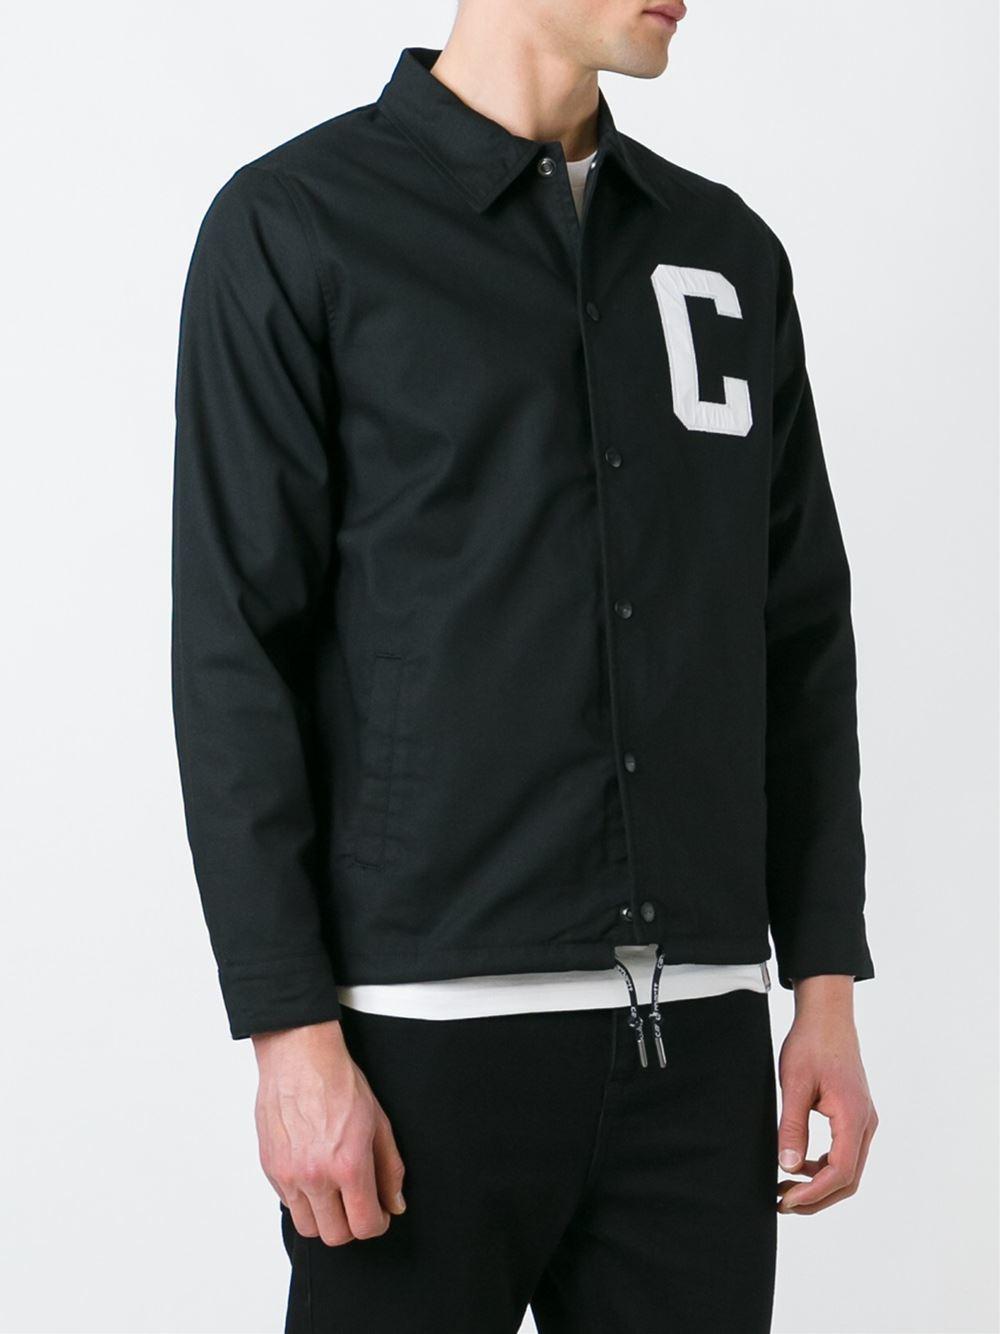 Carhartt Cotton 'penn' Jacket in Black for Men - Lyst